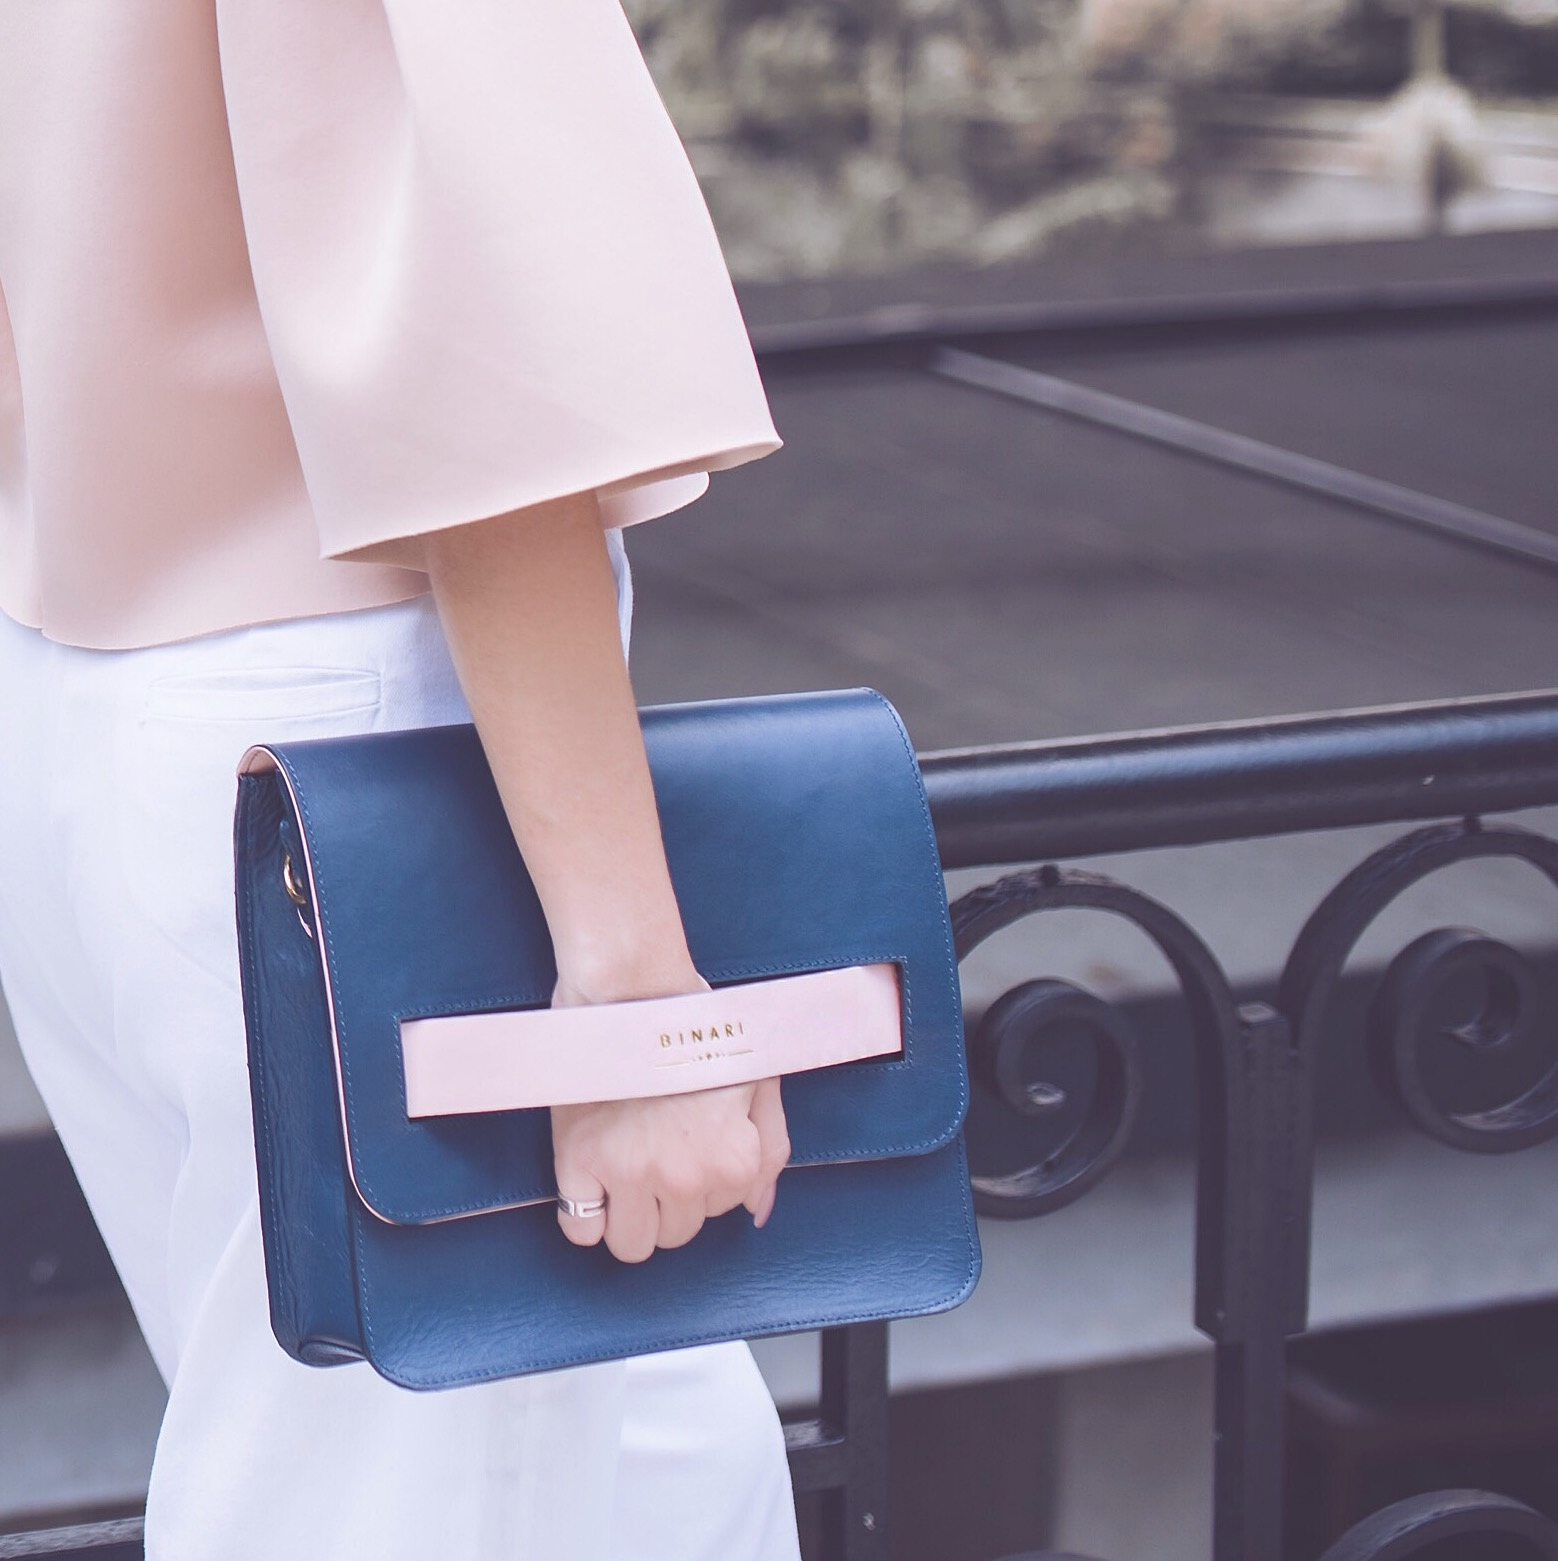 bolsas-binari-como-usar-look-casual-look-trabalho-10